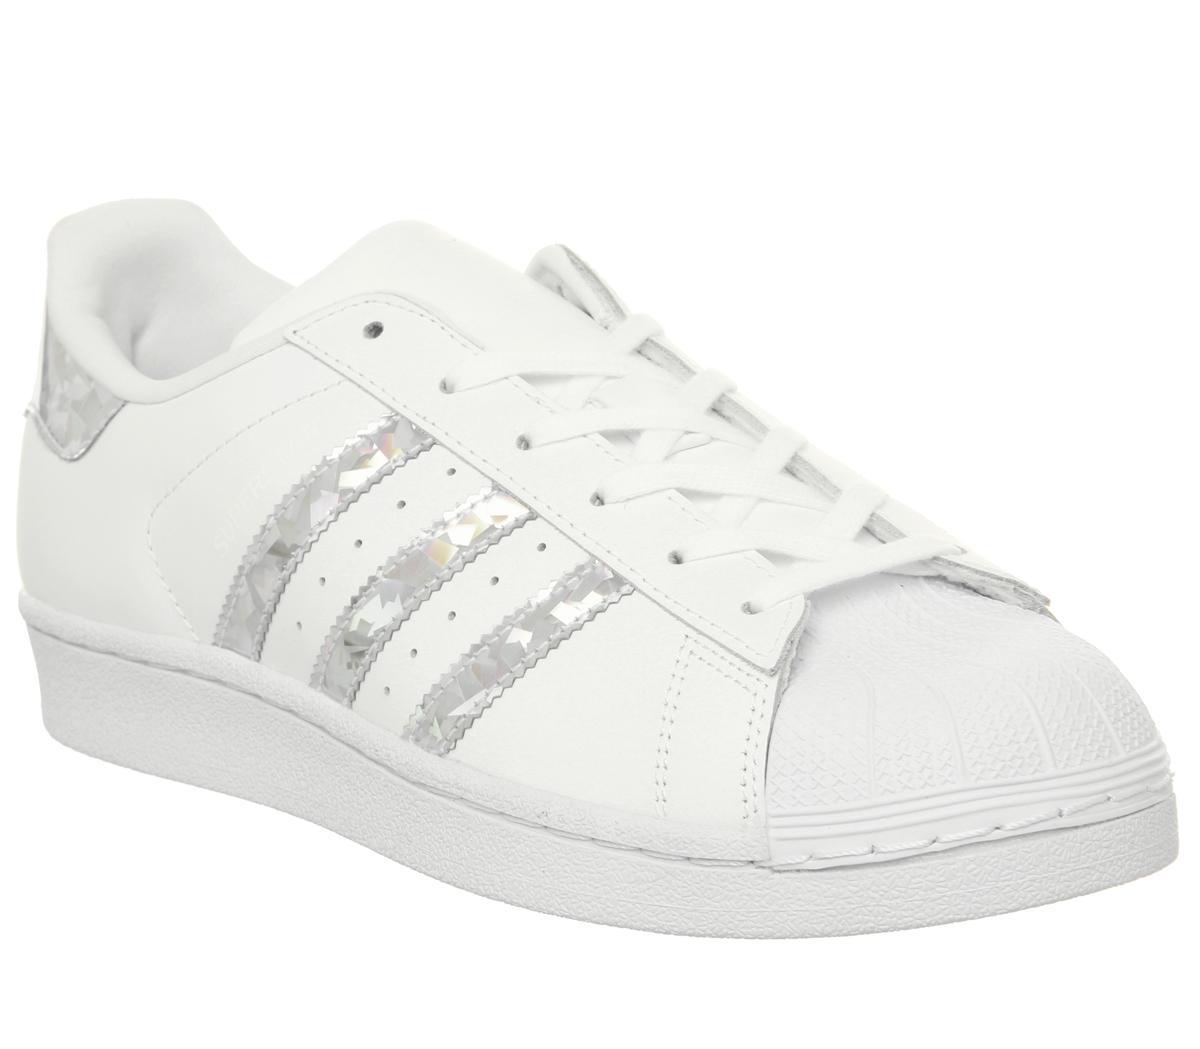 adidas Superstar Women's white silver white, 39.5